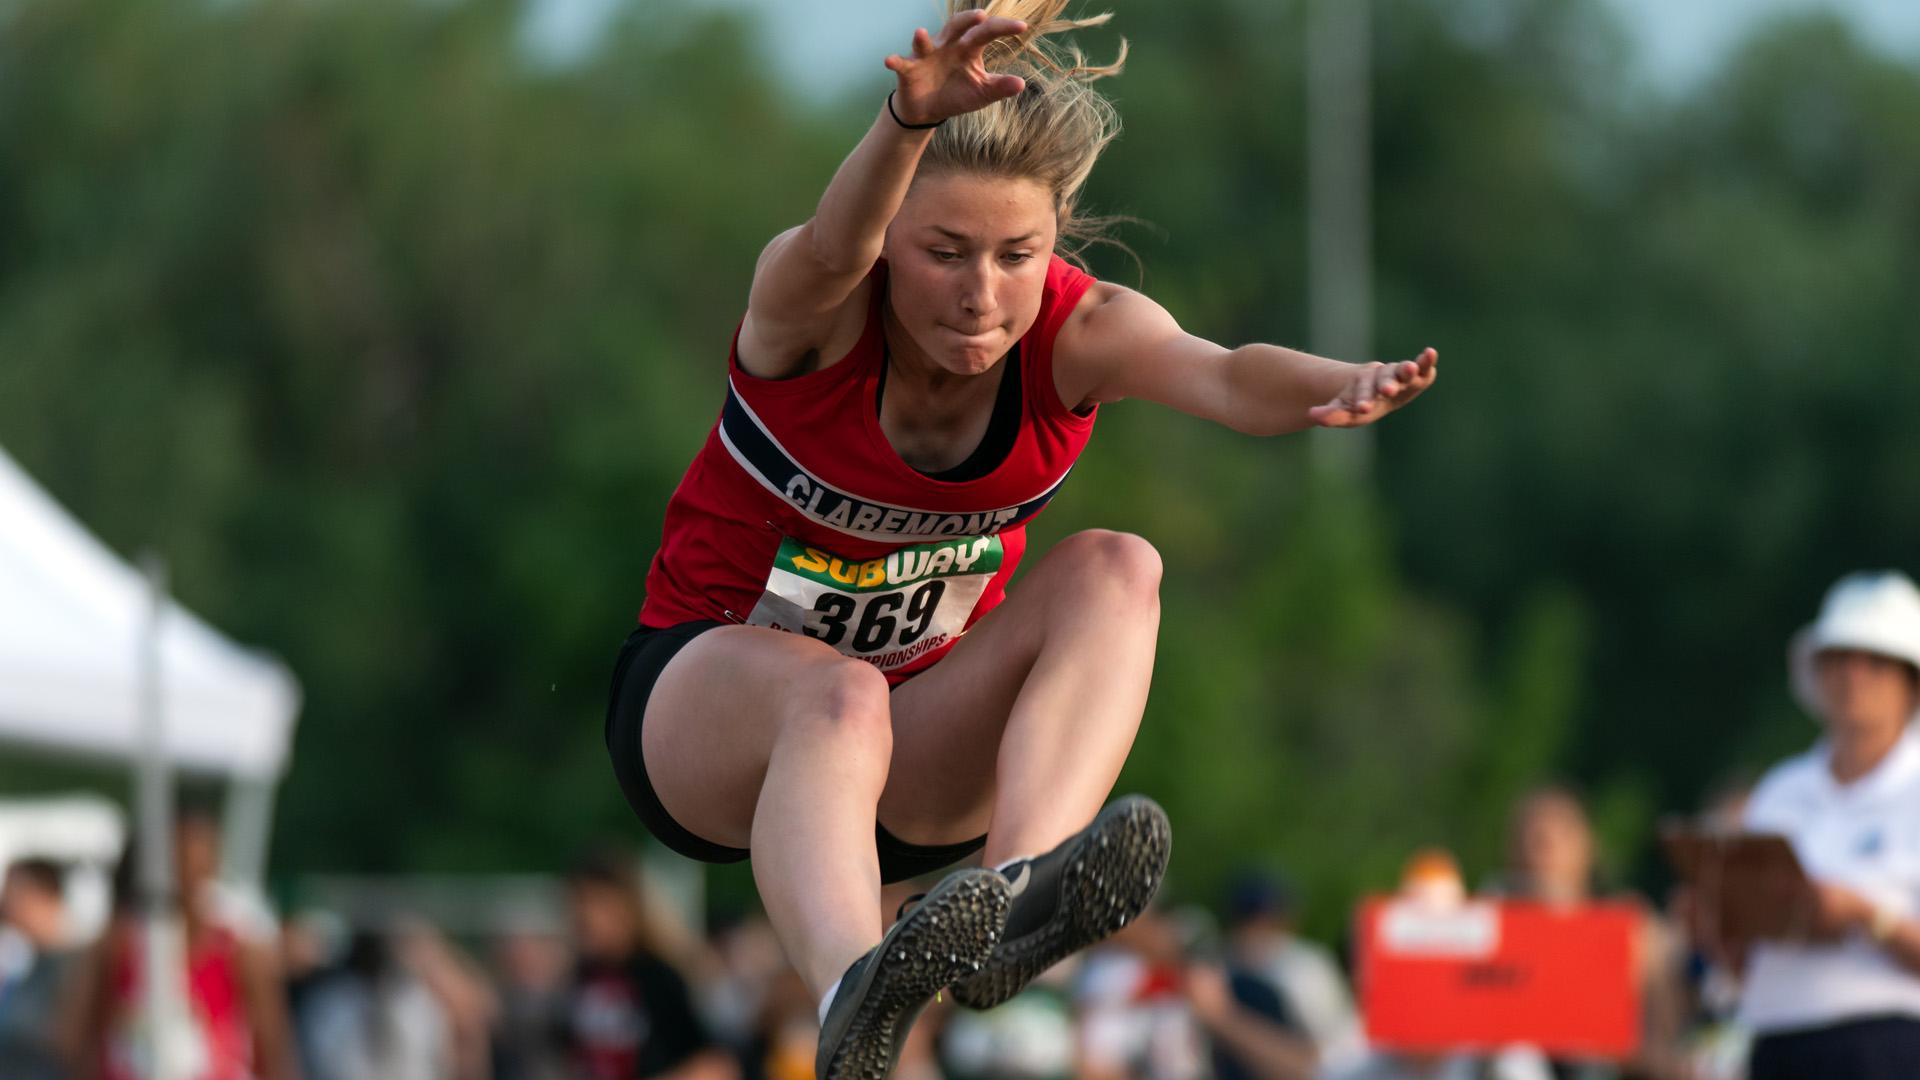 Rebecca Dutchak - 2019 B.C. High School Track and Field Championships - Day 1